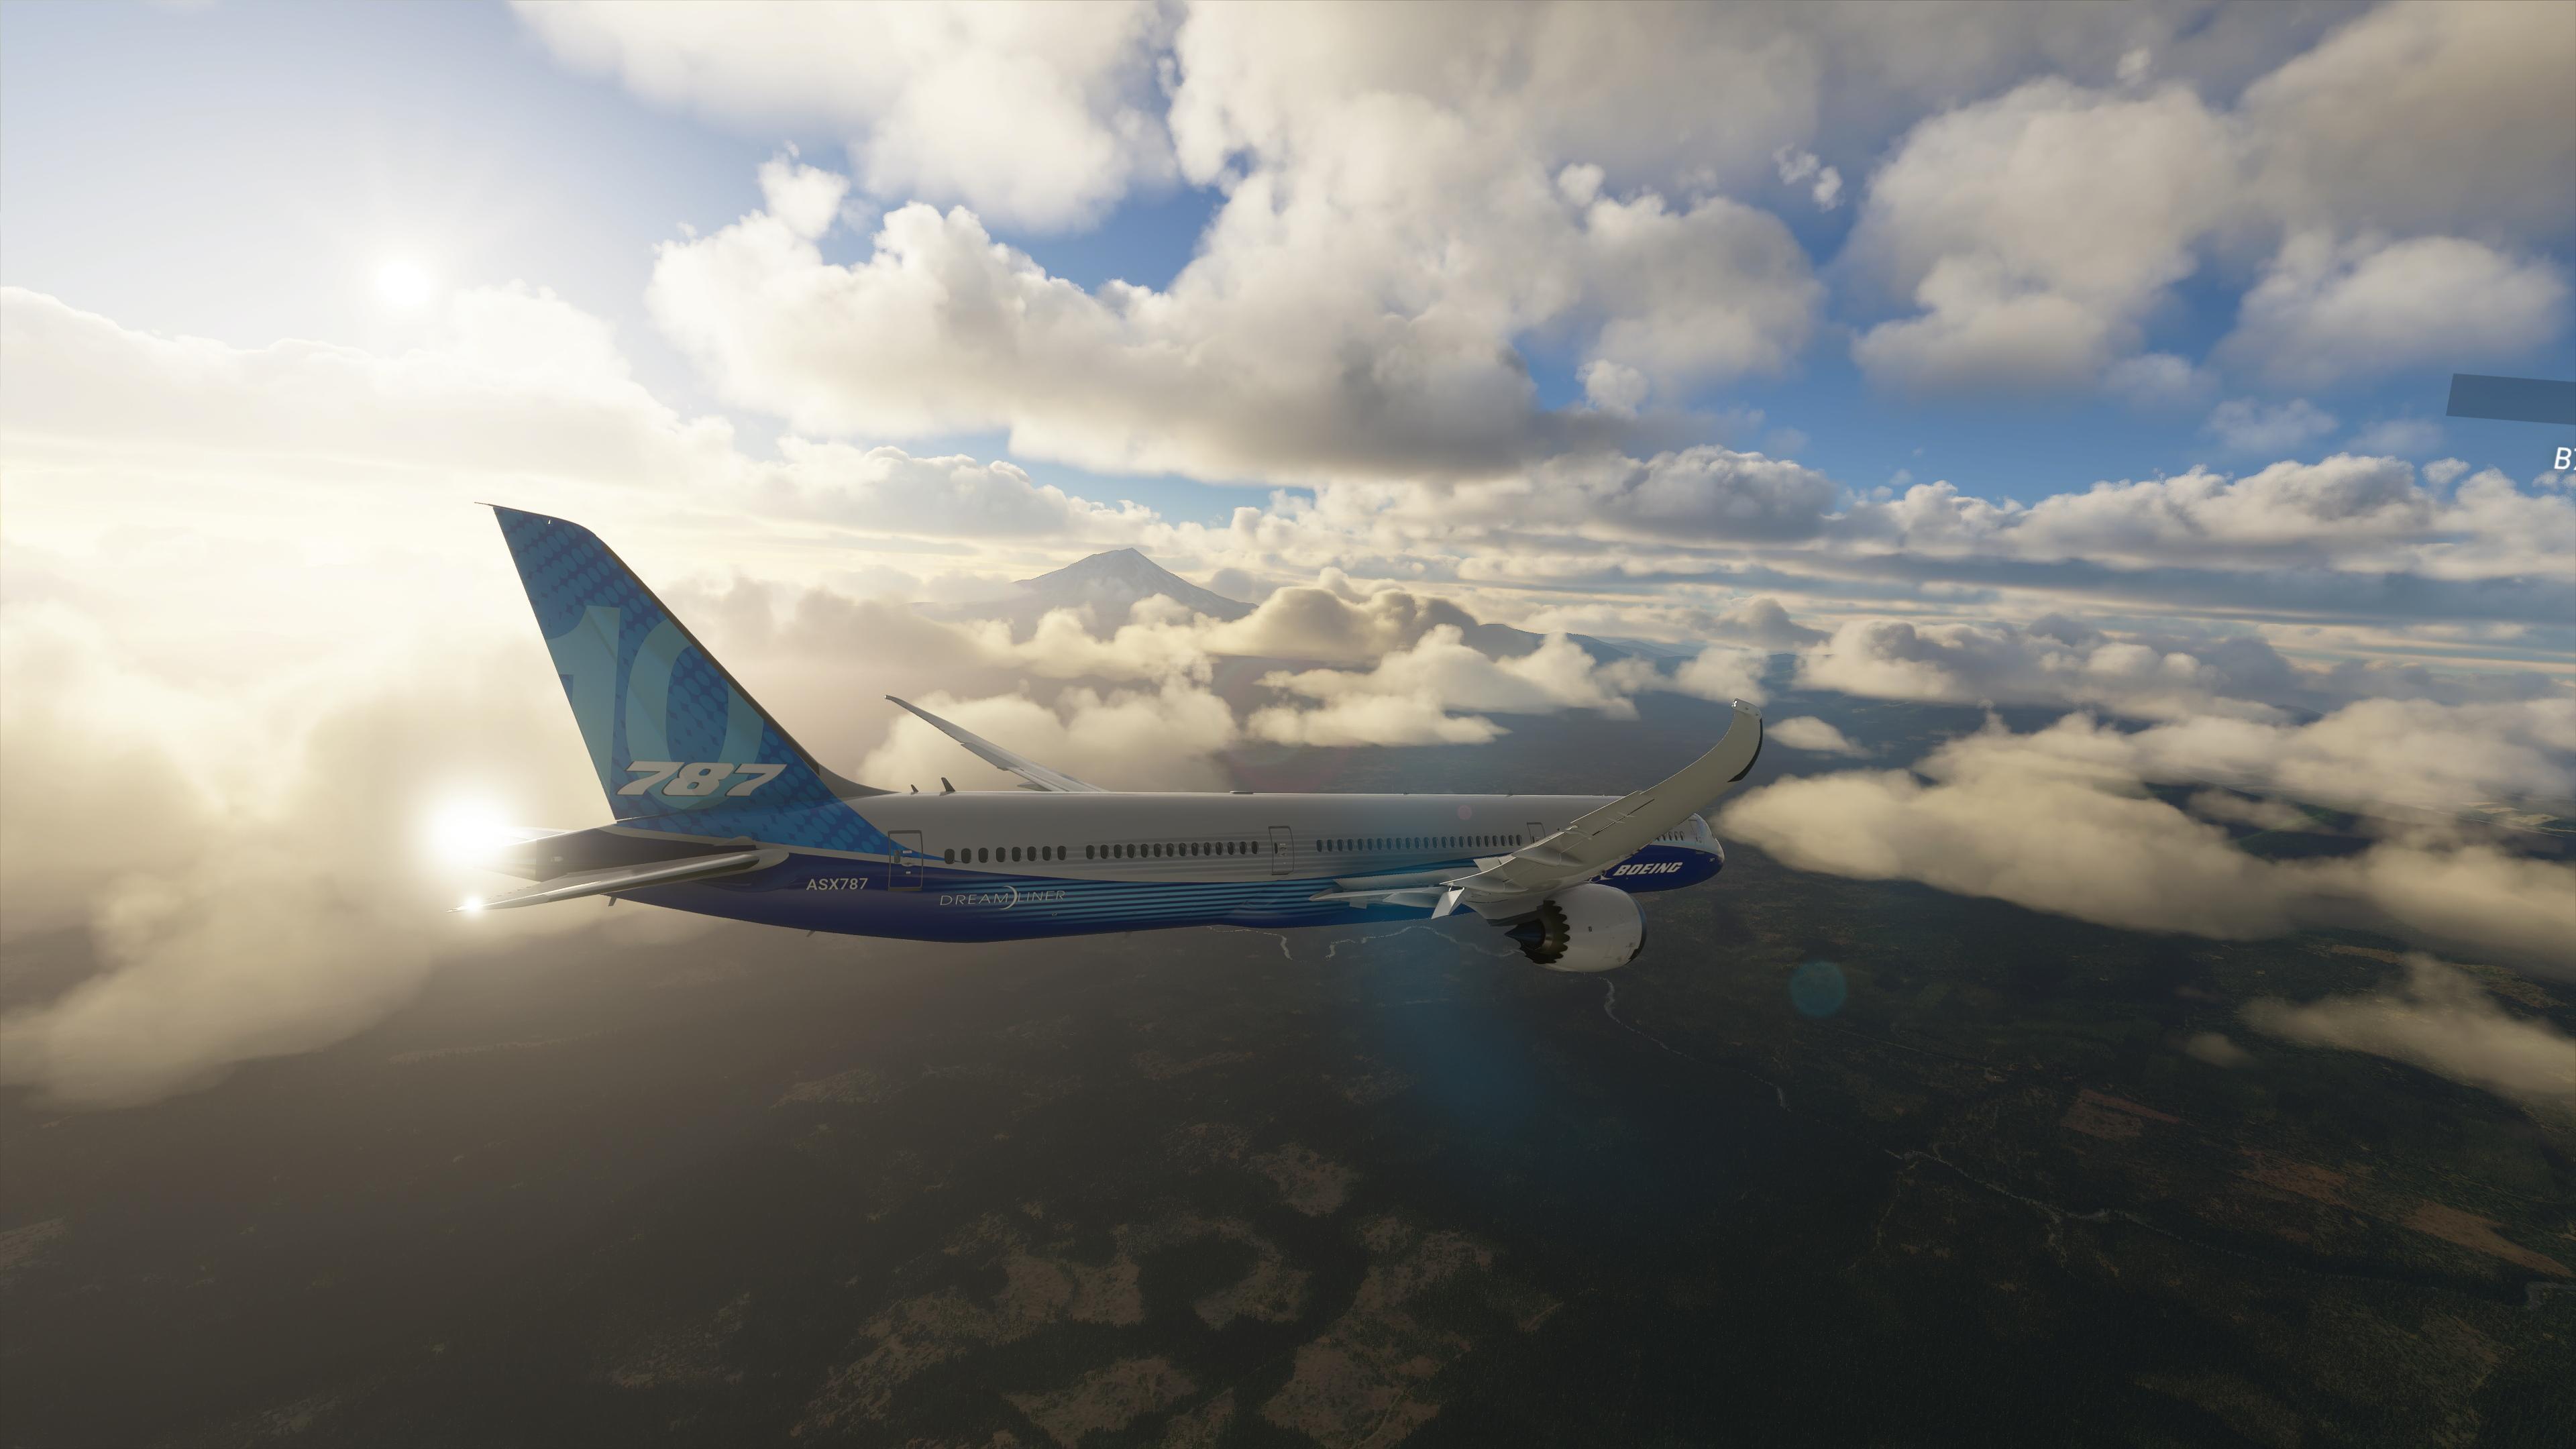 Terrain Level of Detail is the most demanding setting in Microsoft Flight Simulator 2020.